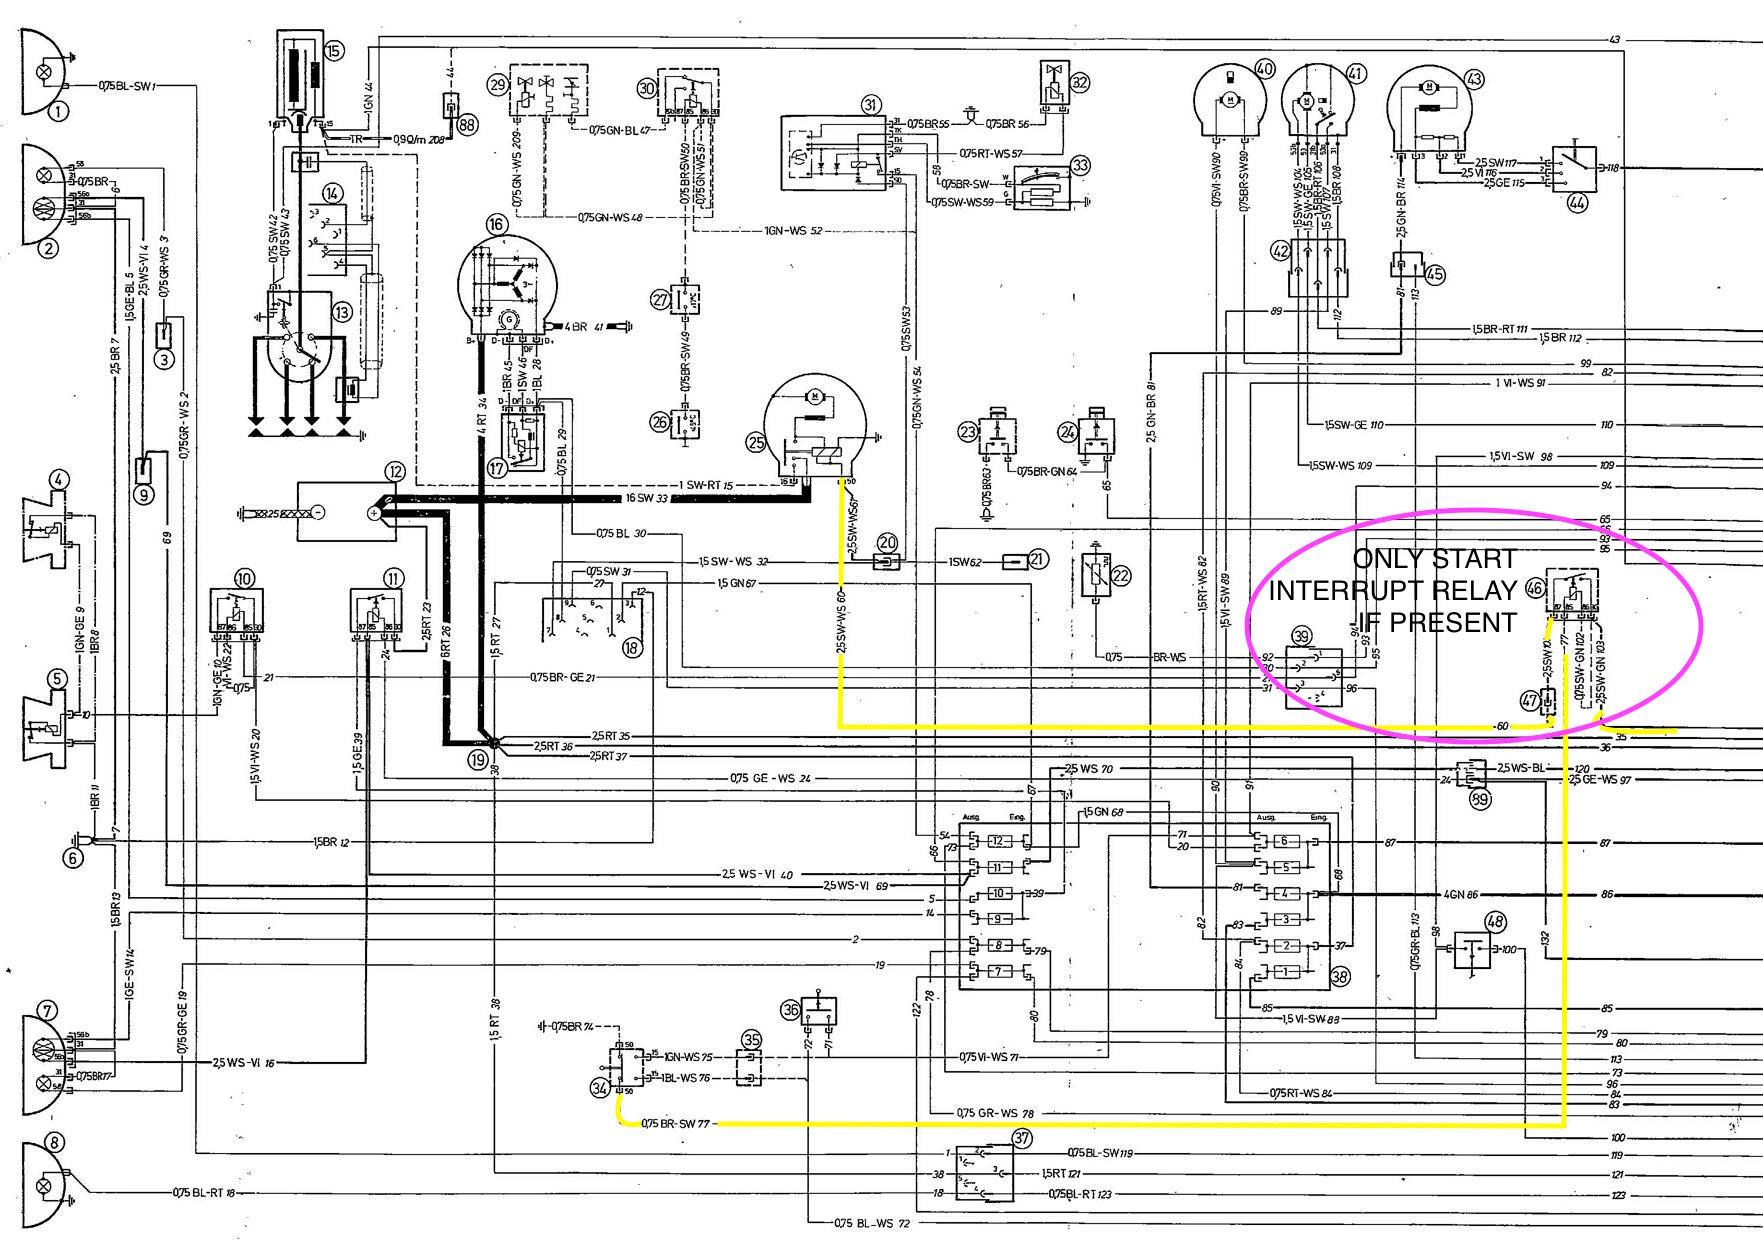 hight resolution of bmw 2002 wiring diagram wire management wiring diagram 1974 bmw 2002 wiring diagram